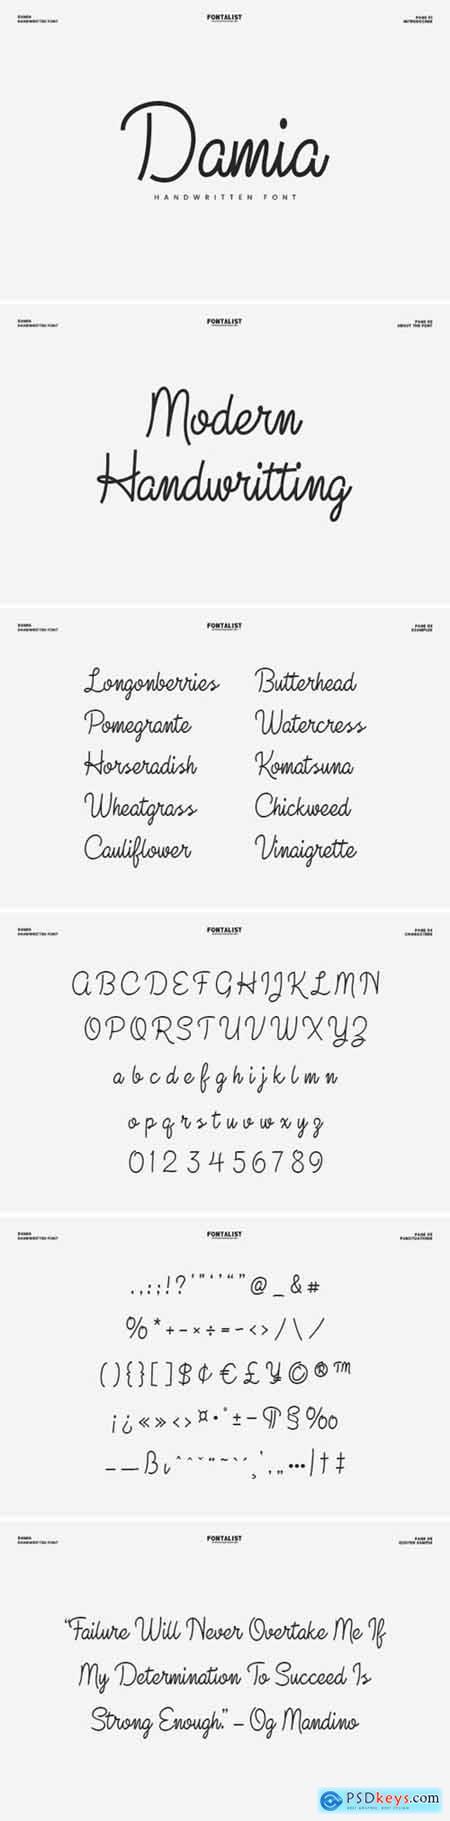 Damia Font